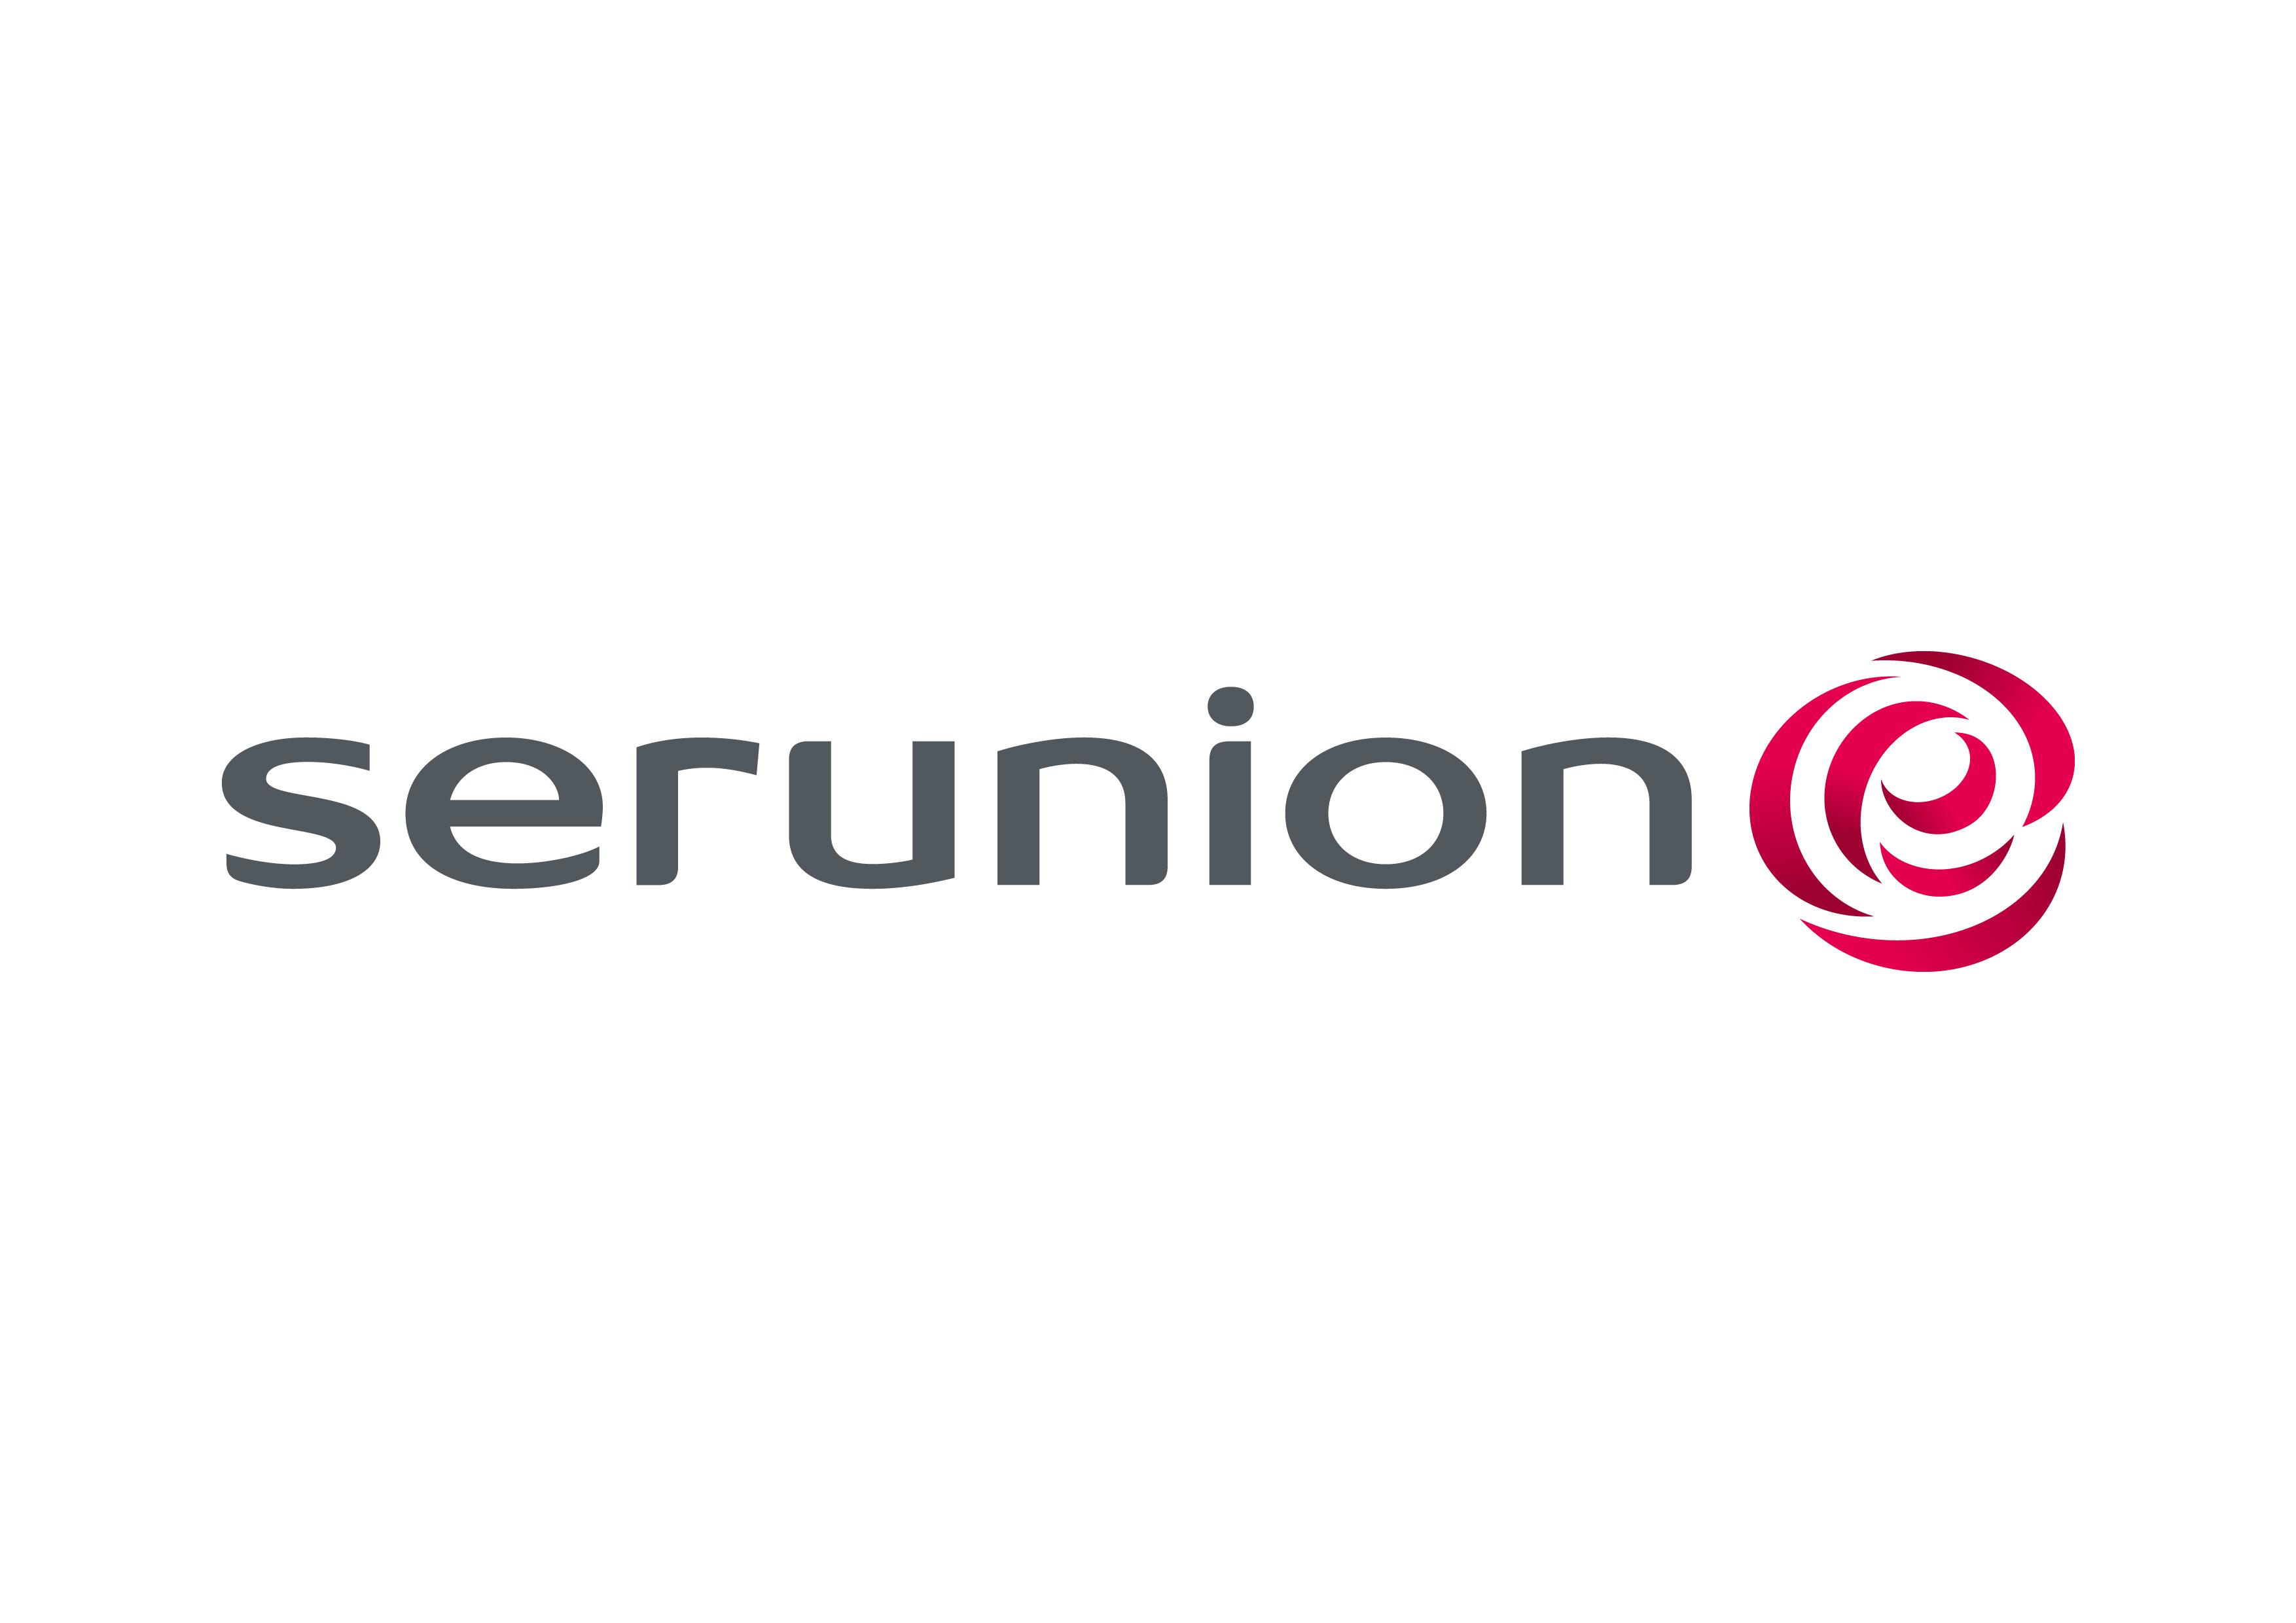 SERUNION-1